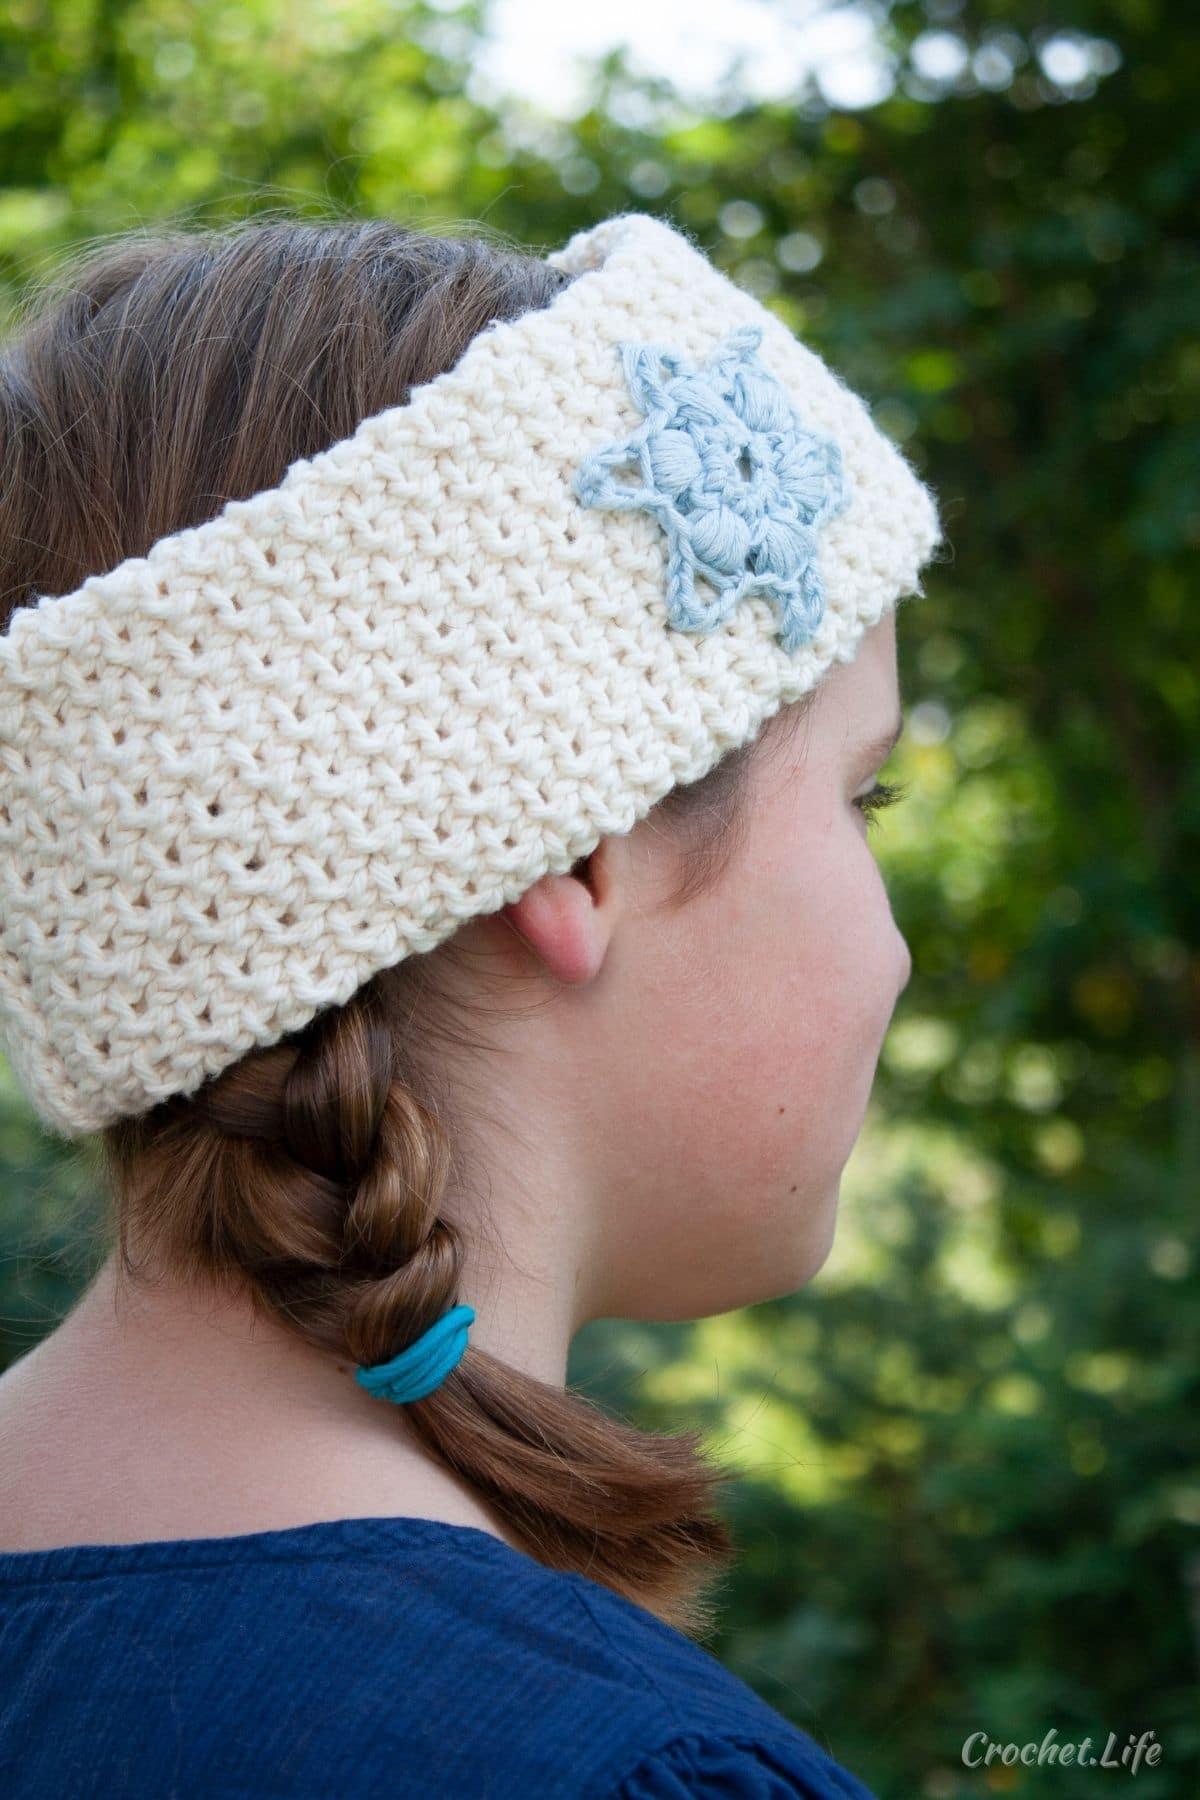 Girl in blue shirt with brown hair in braids facing away wearing white crochet headband